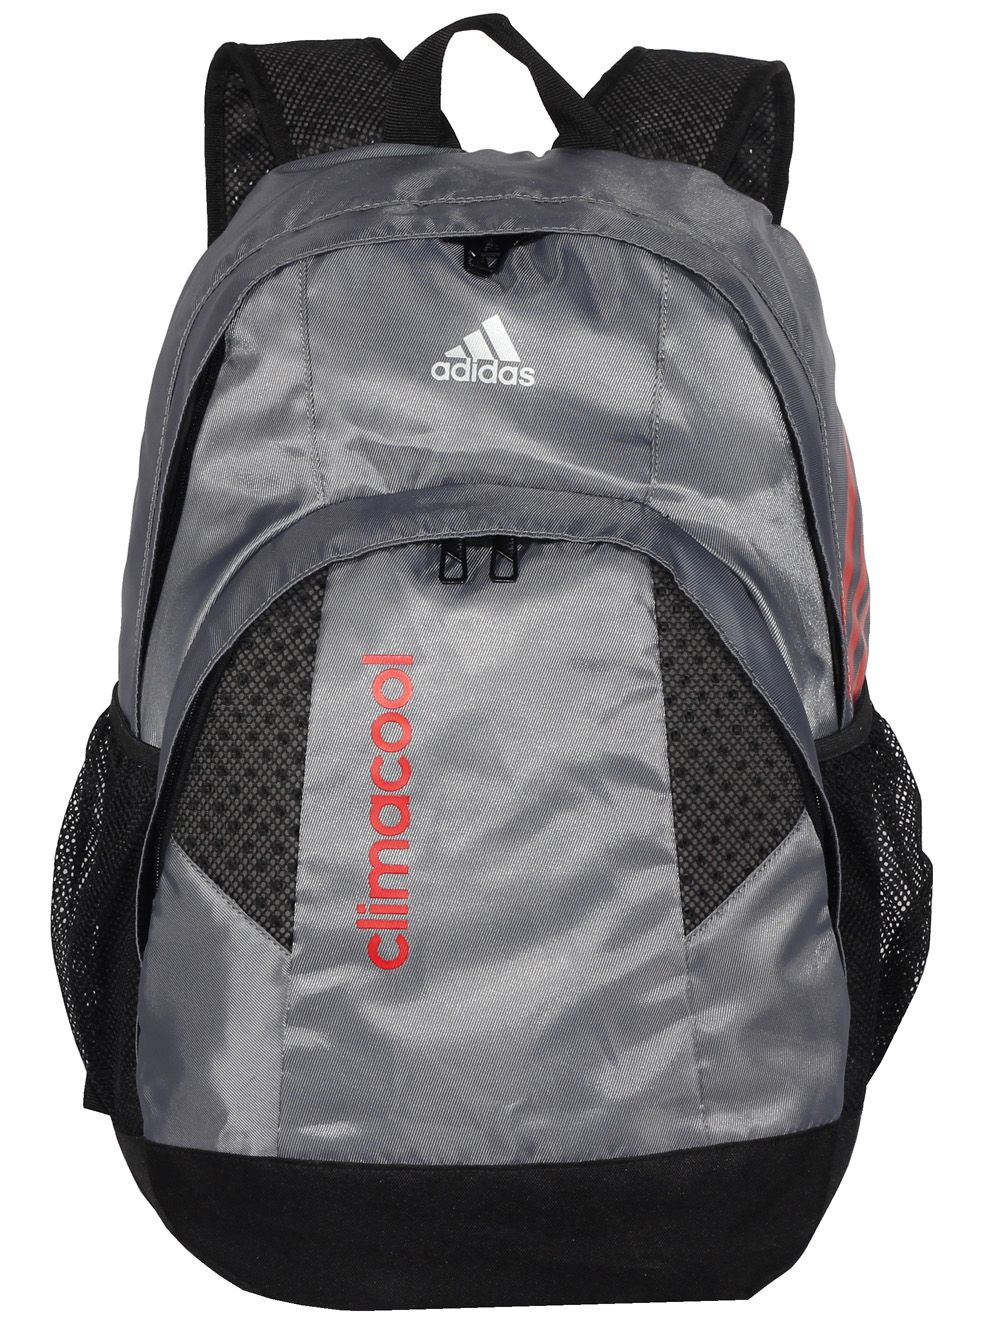 ddfb433a60 Adidas Clima Z26121 Backpack Grey - Balo laptop - Shop Balo máy ảnh ...